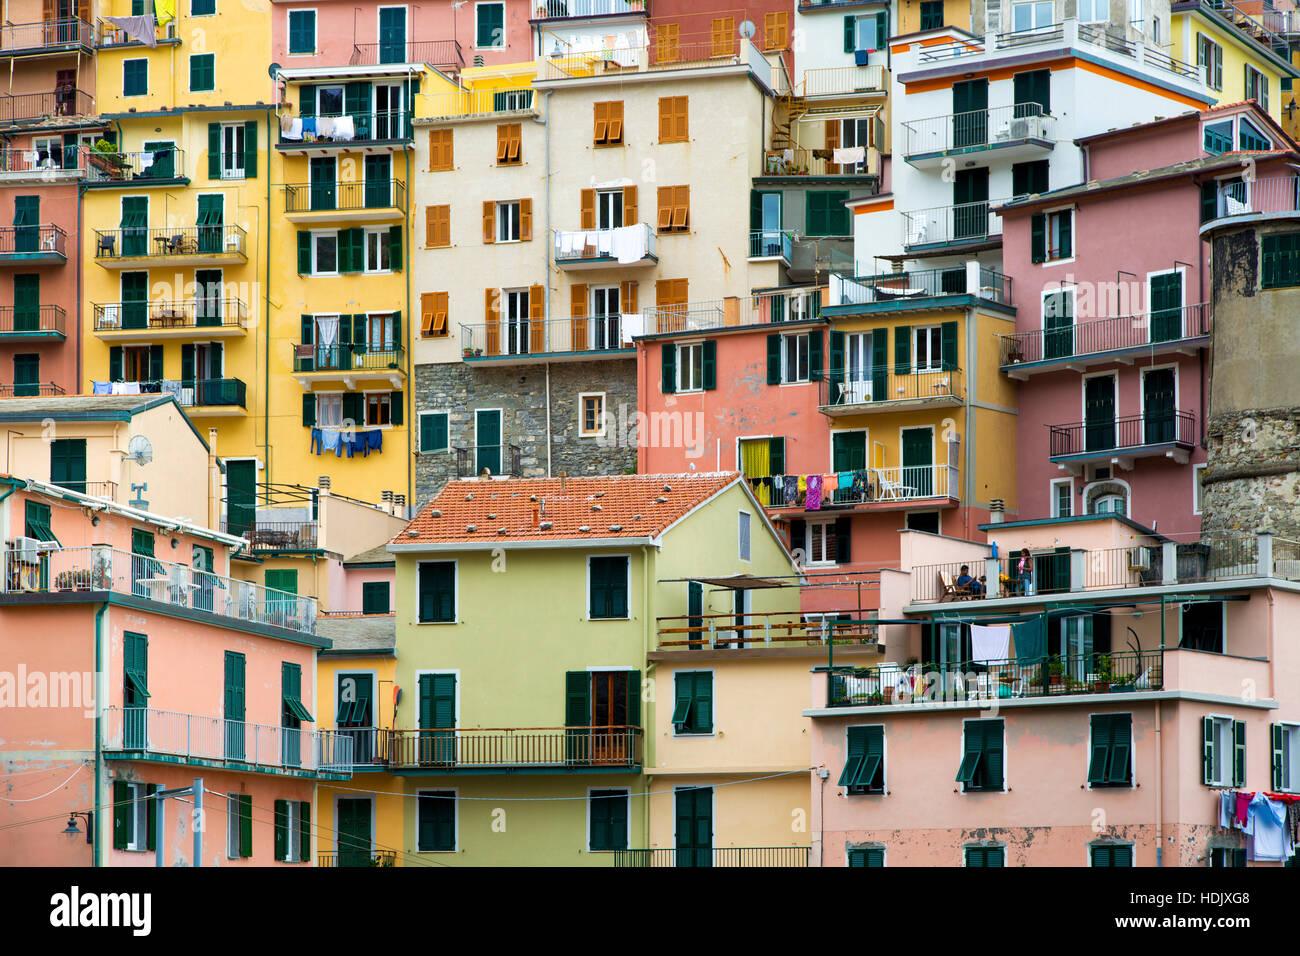 Häuser in Vernazza, Cinque Terre, Ligurien, Italien Stockbild